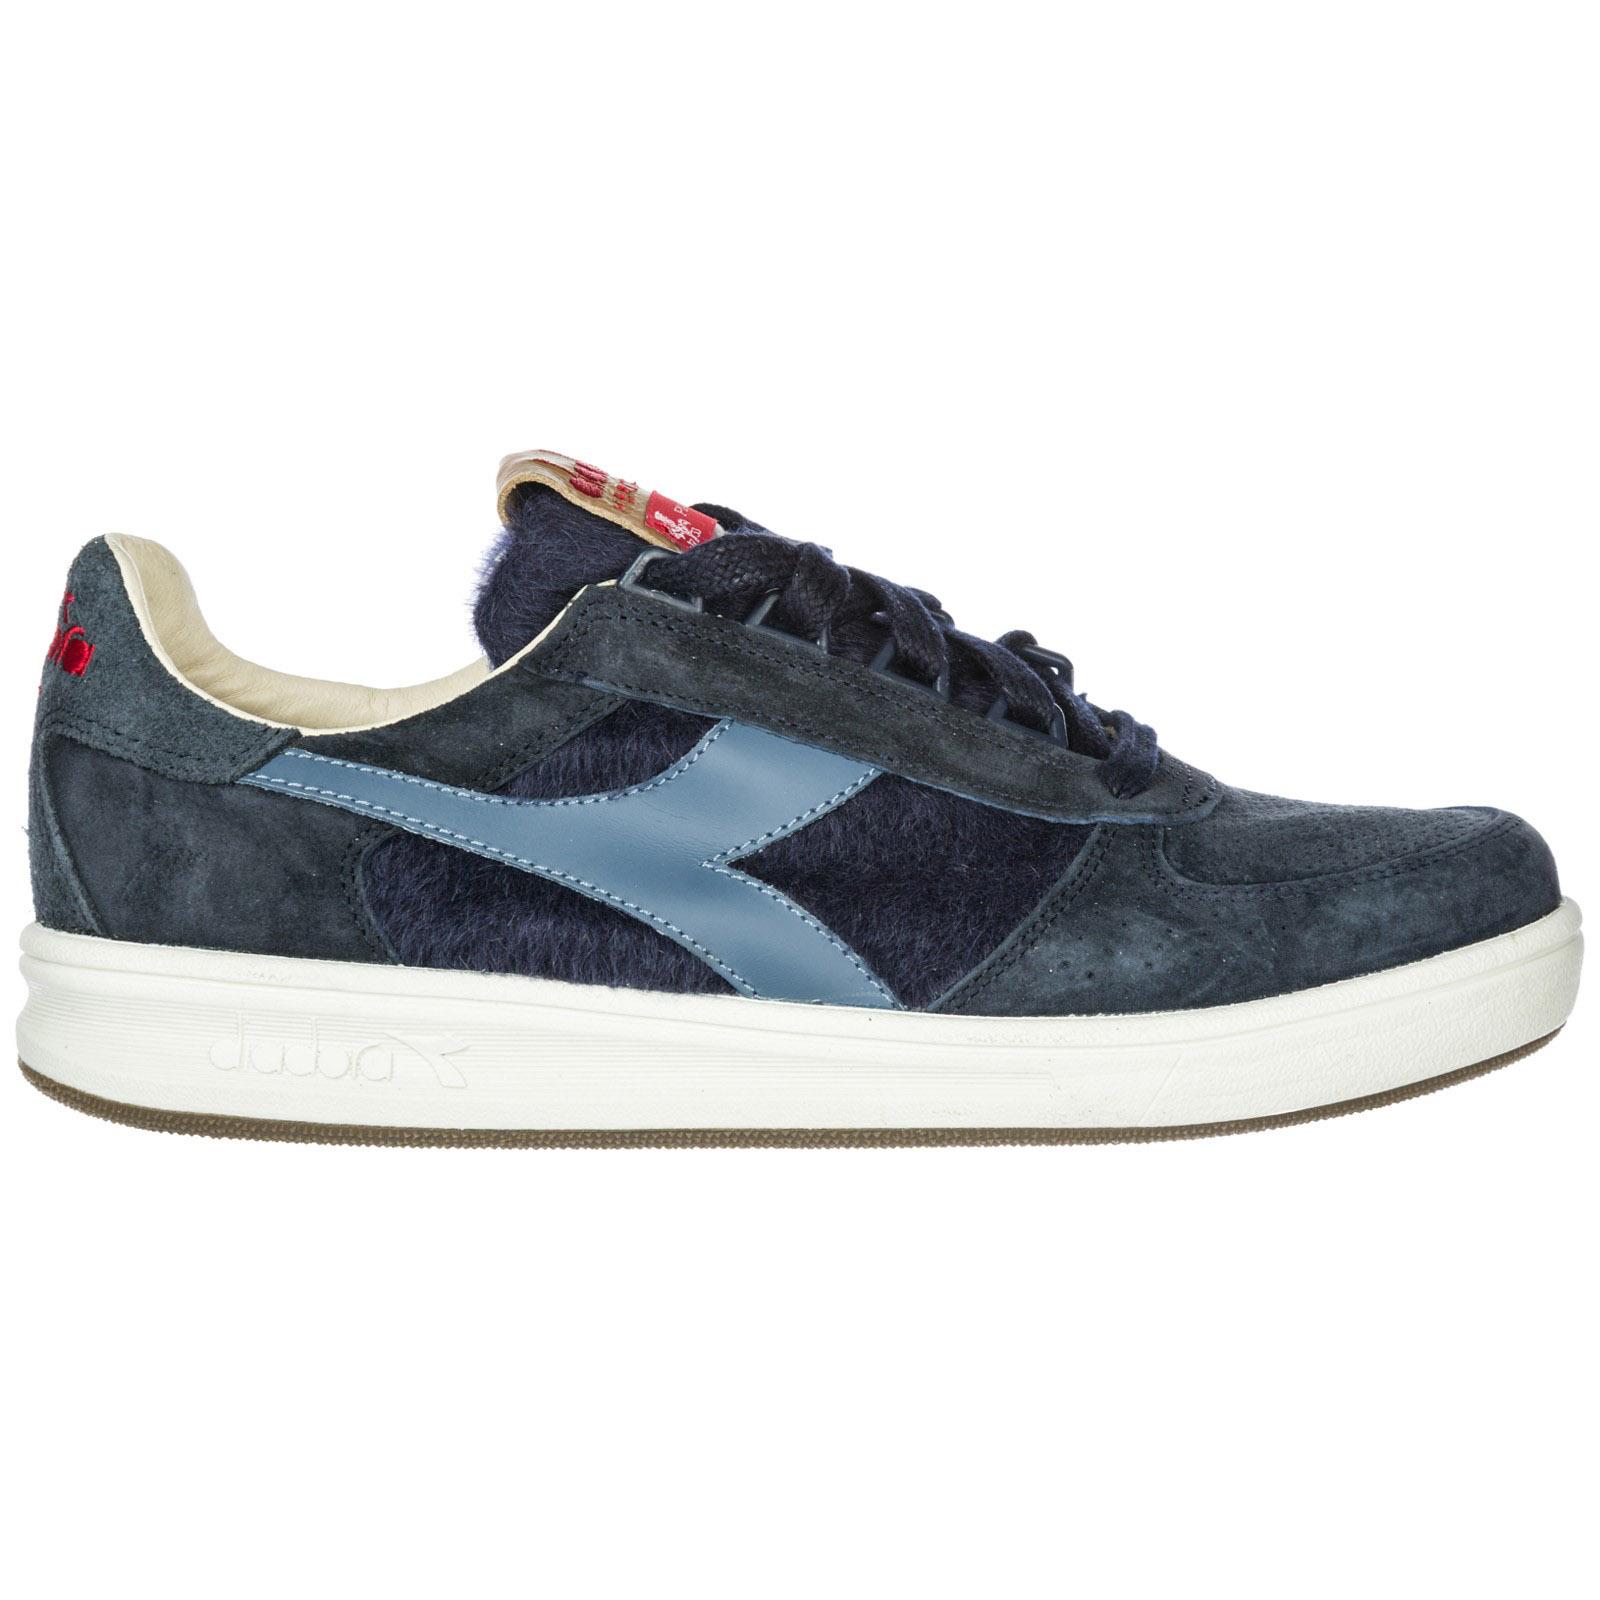 Scarpe sneakers uomo camoscio b elite